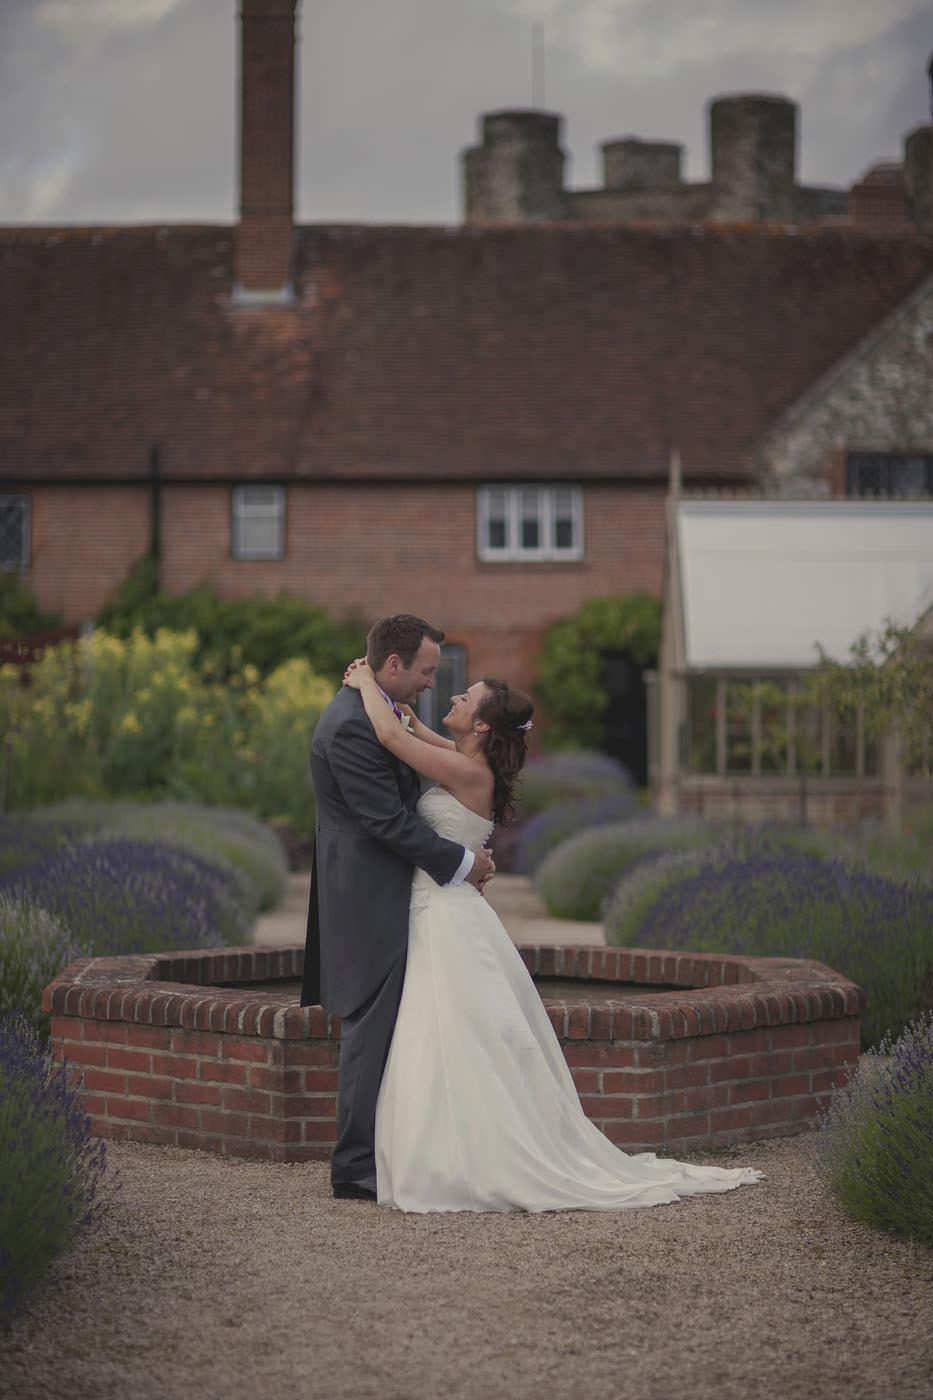 chrissarah walled garden midhurst wedding photographer 0132